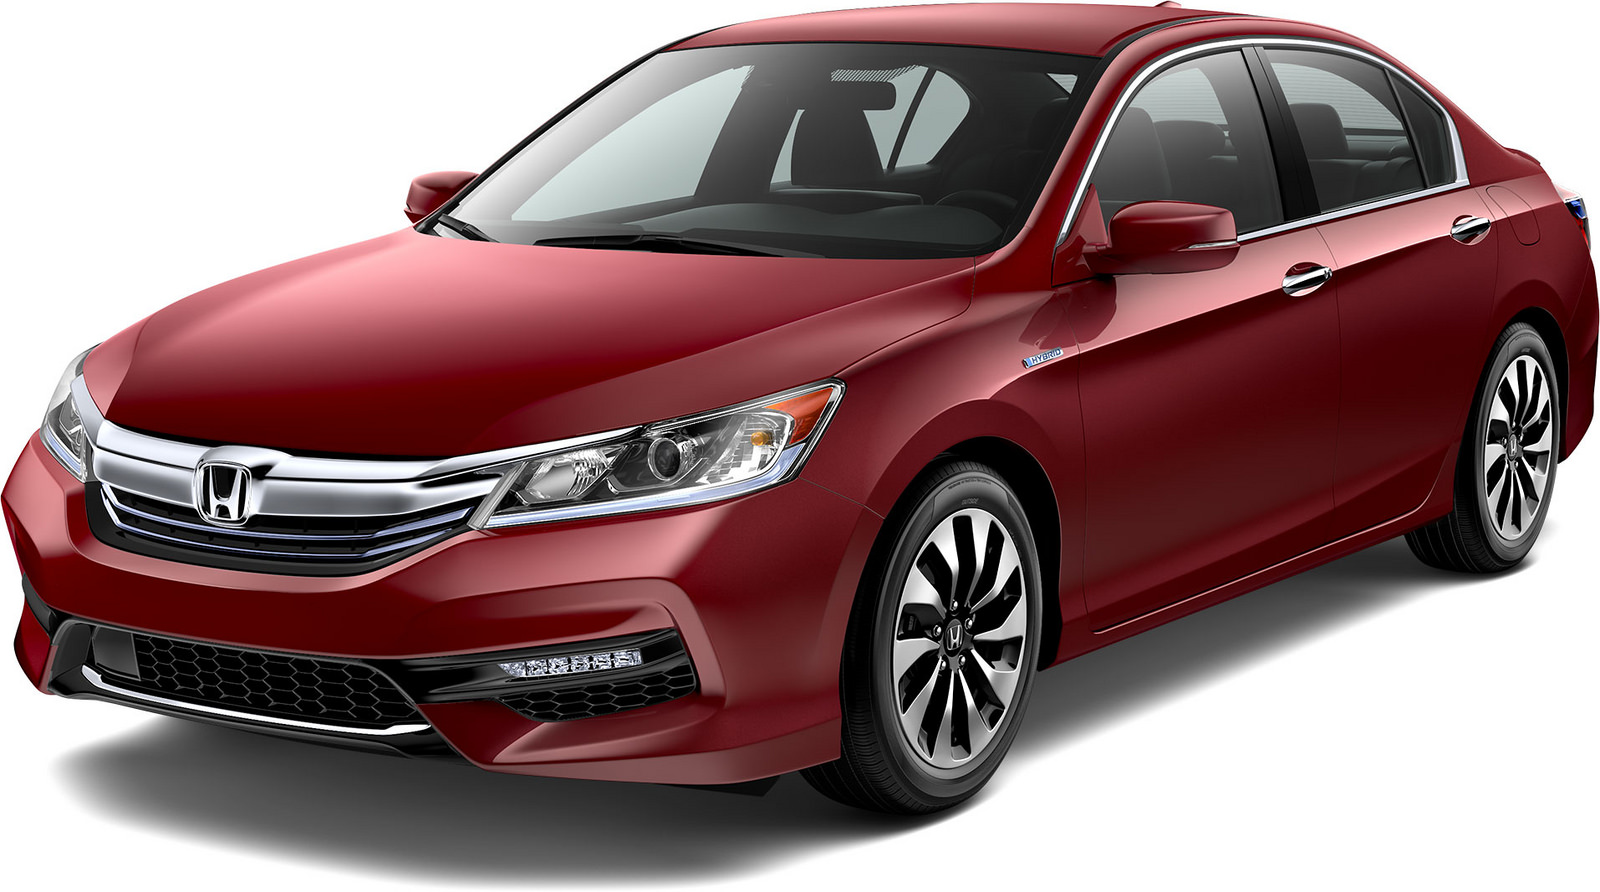 2017 Honda Accord Hybrid in Milwaukee, WI - Schlossmann Honda City